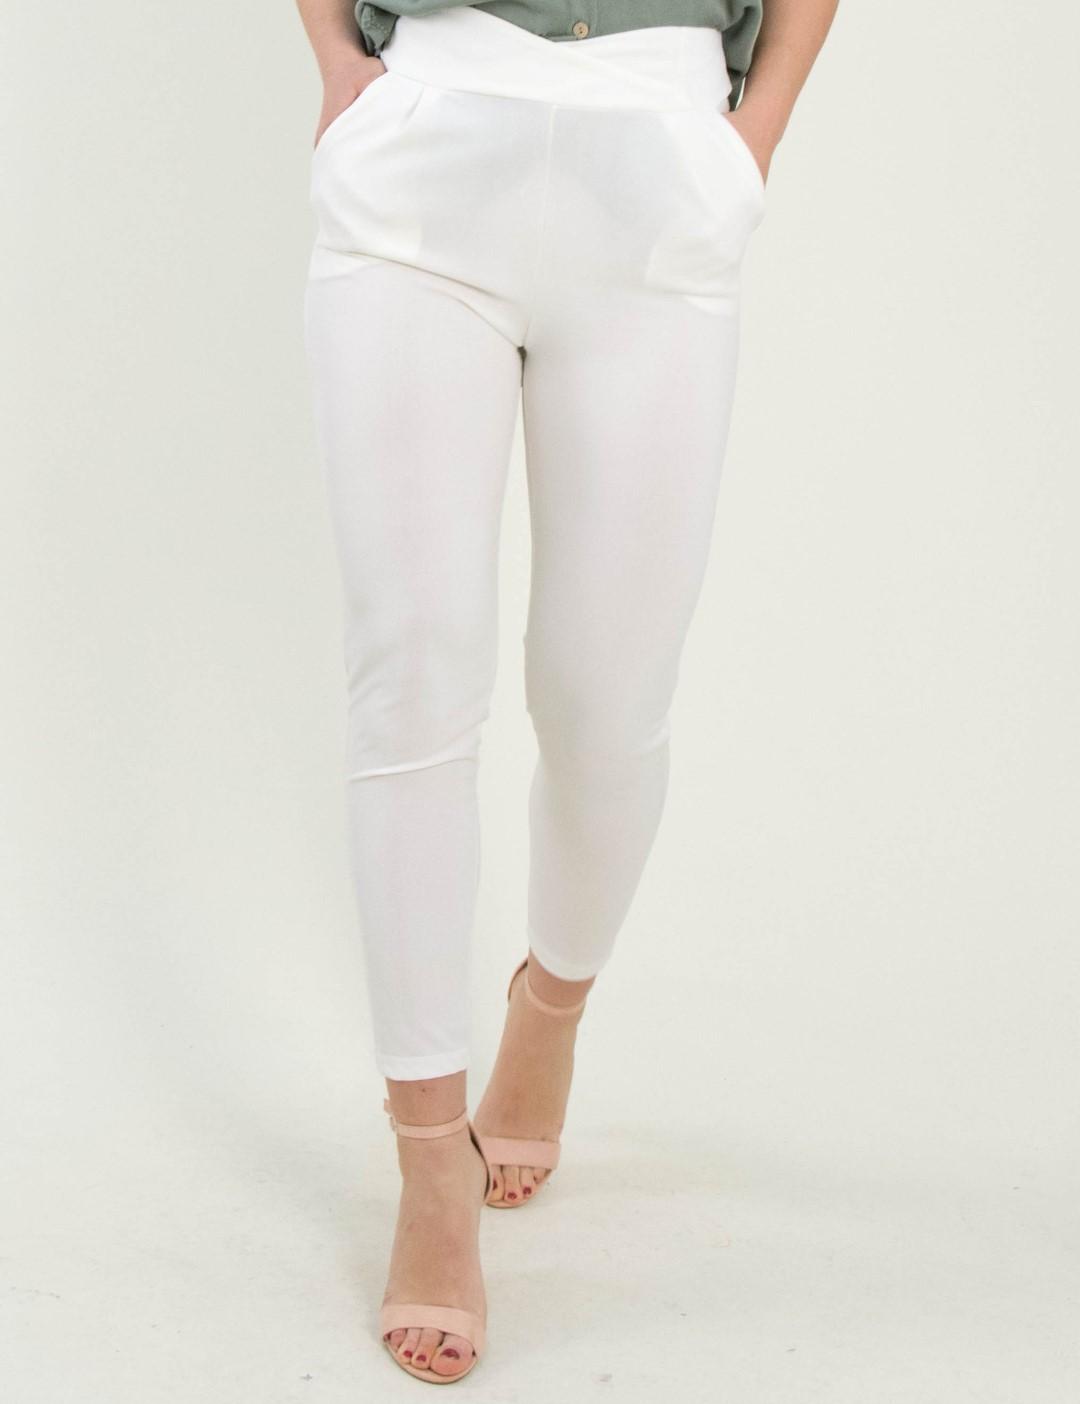 0ef25b539d3a Γυναικείο λευκό ψηλόμεσο παντελόνι με τσέπες So Sexy 41148A